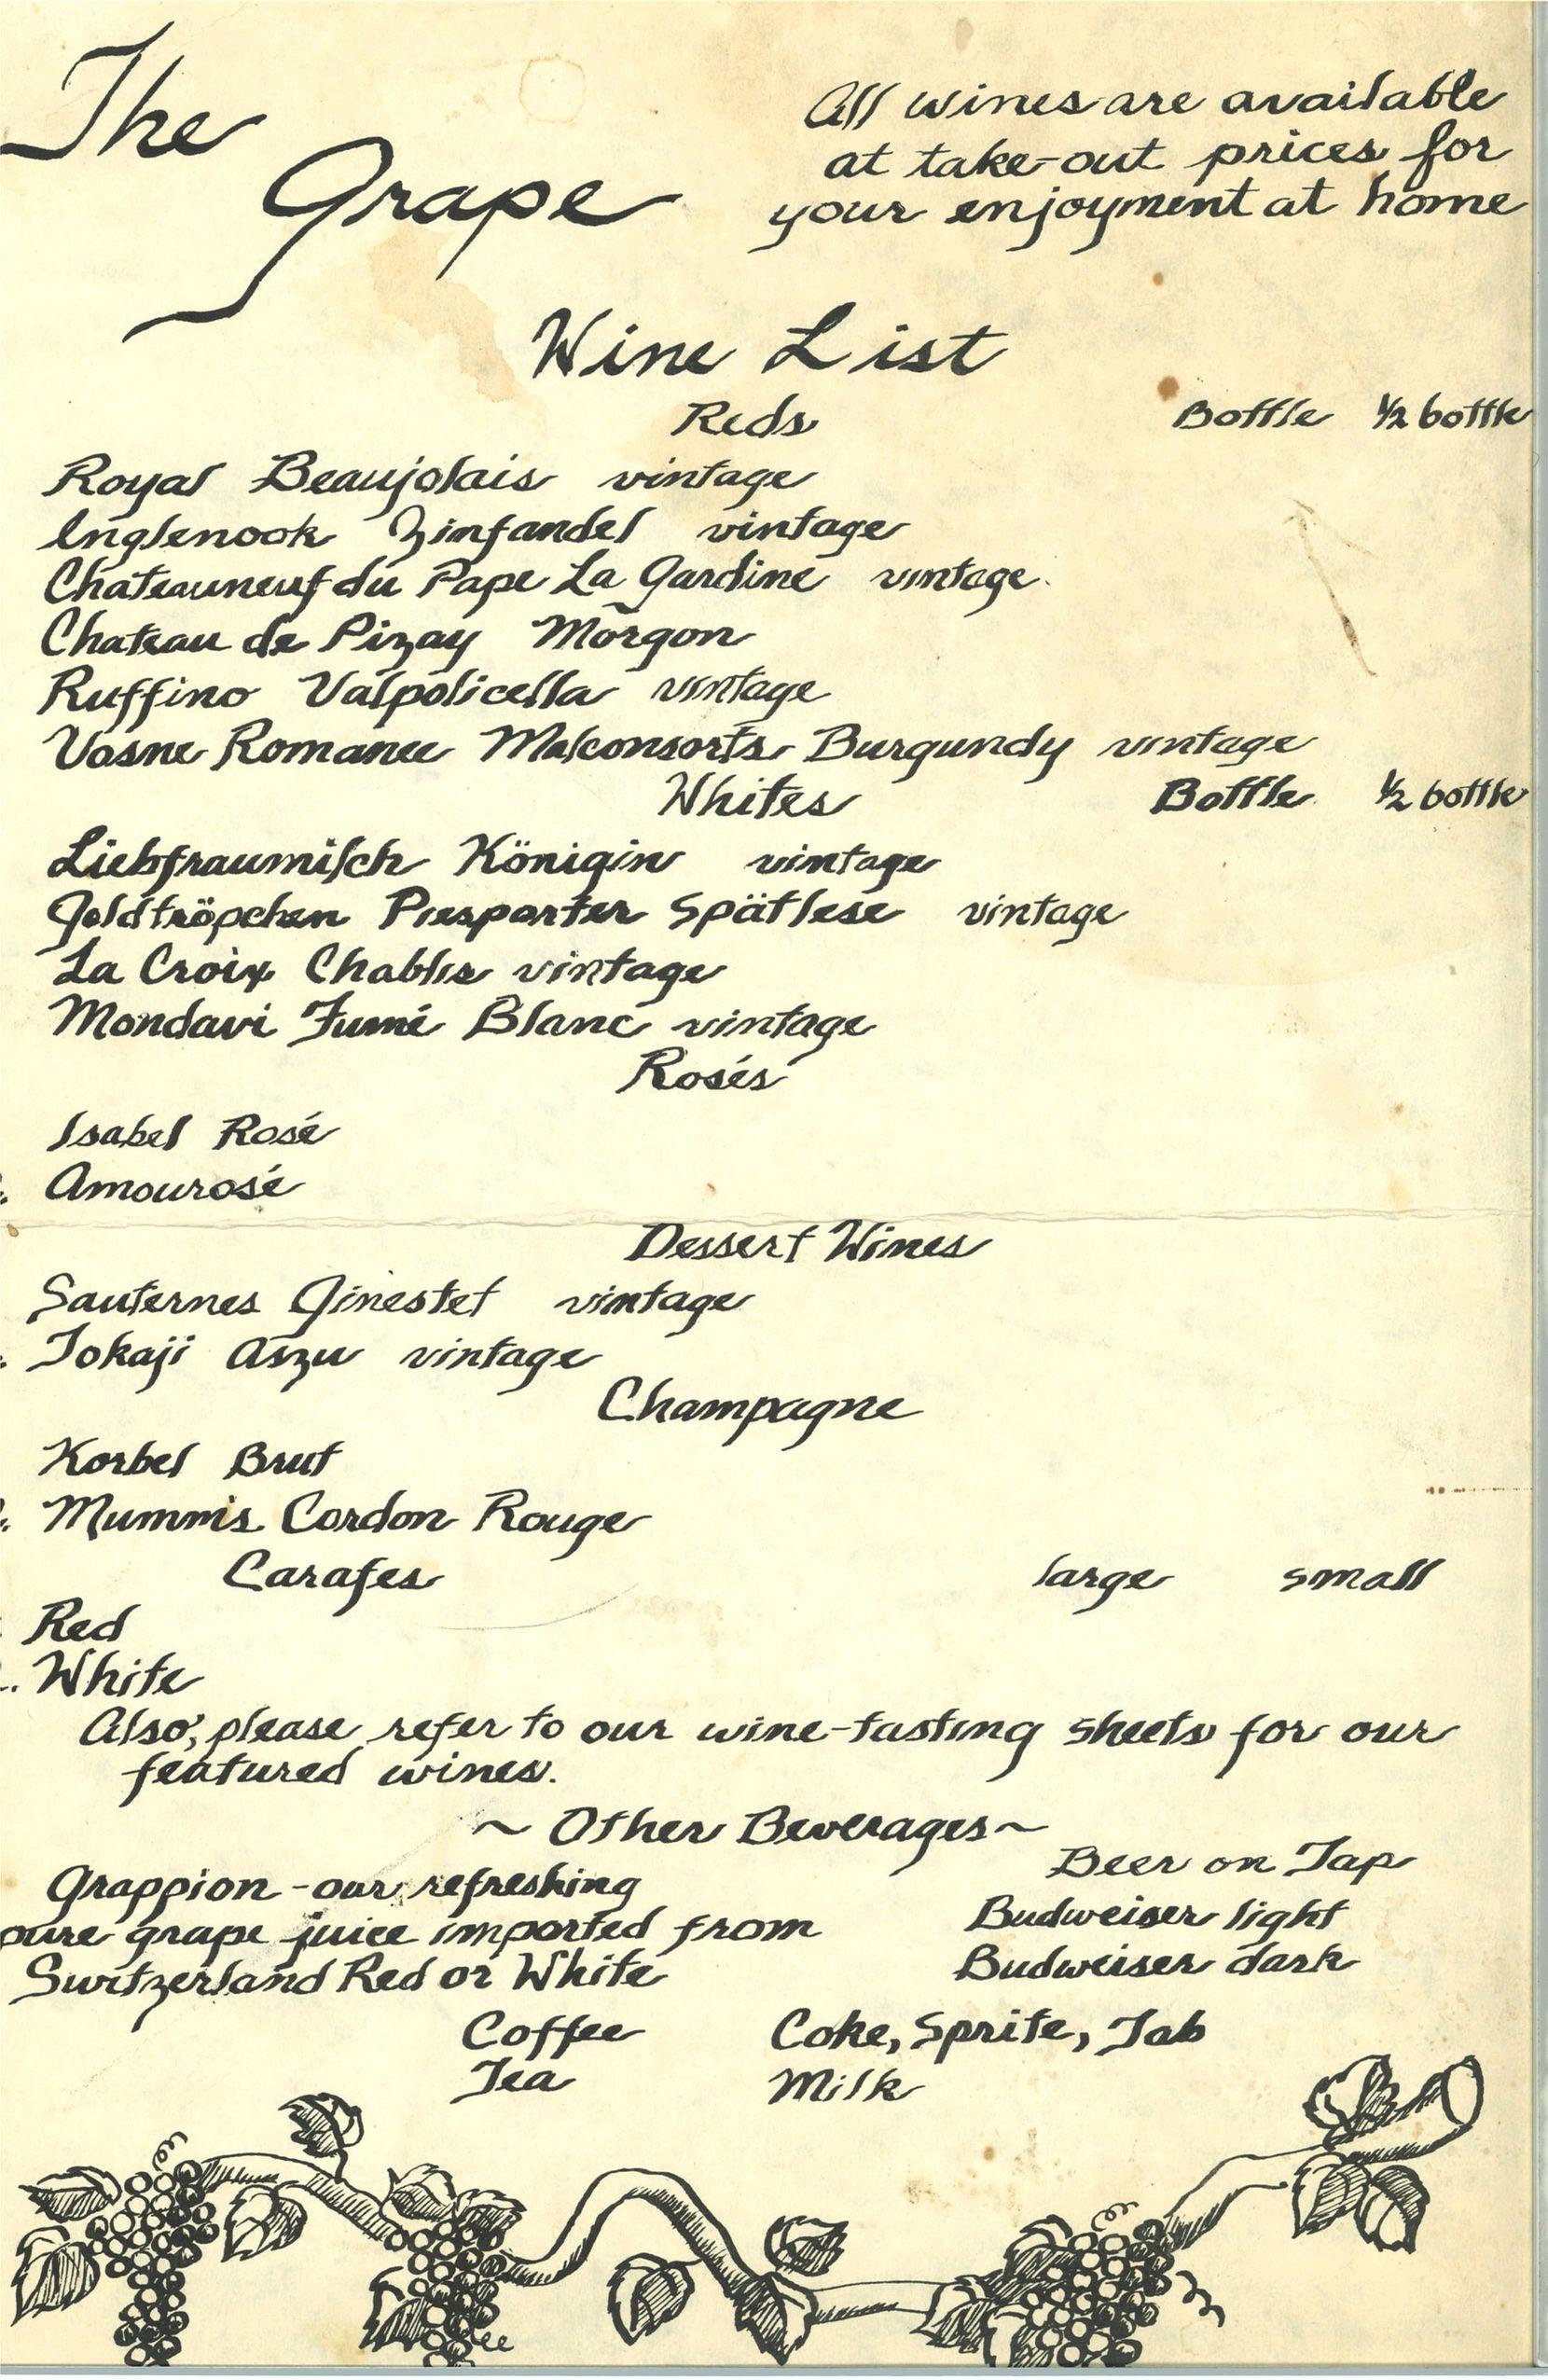 The original wine list